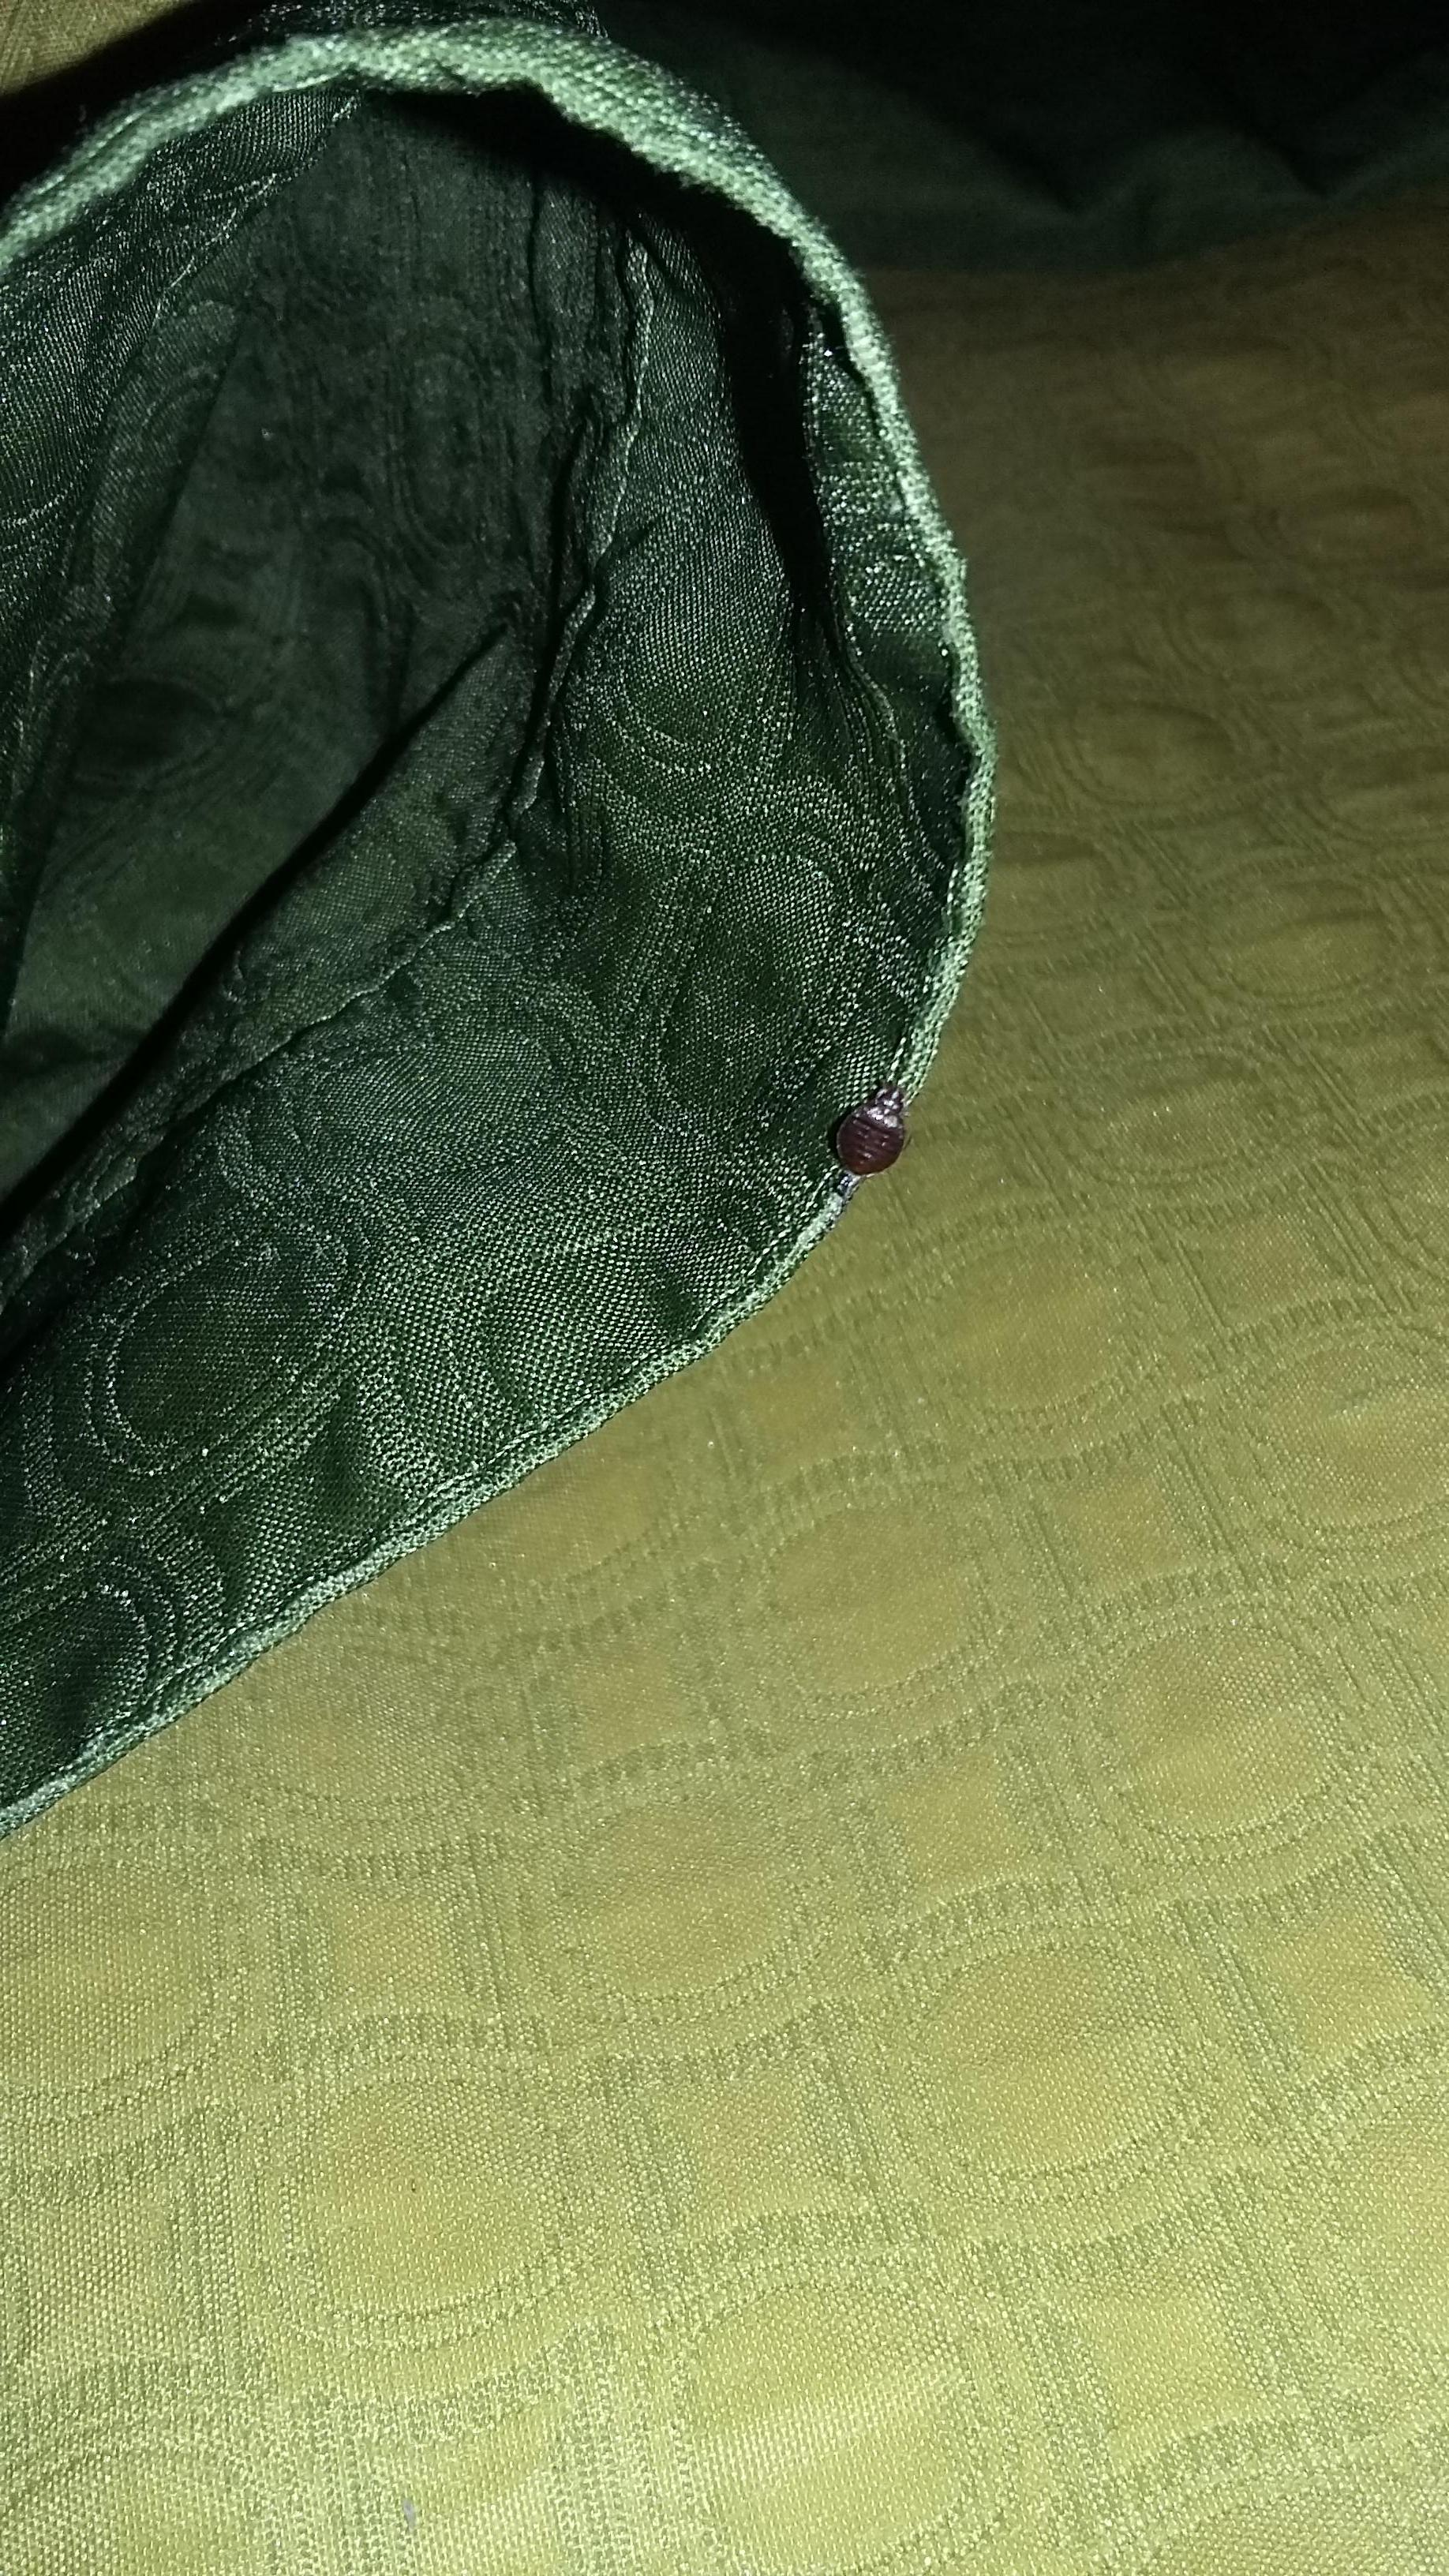 tiny bug #2